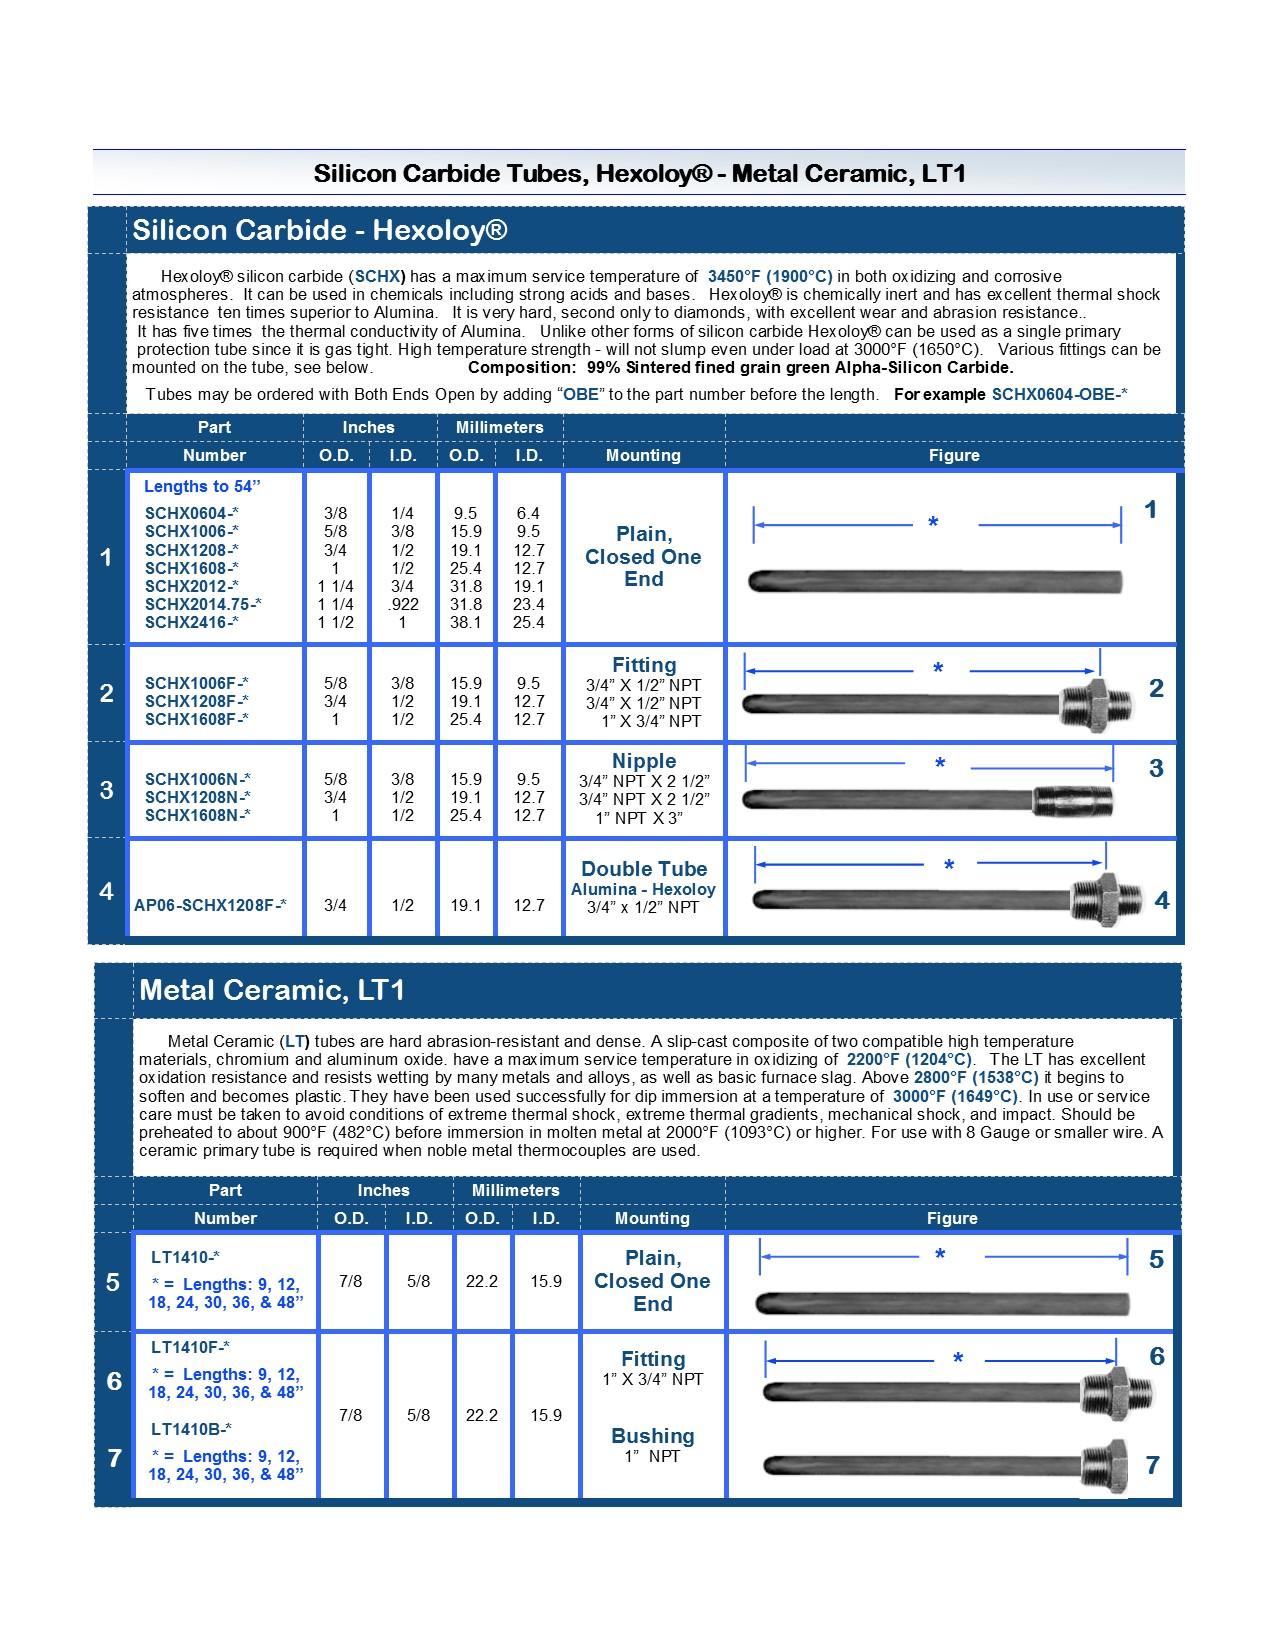 p109 Tubes Hexoloy and Metal Ceramic 20171014-1